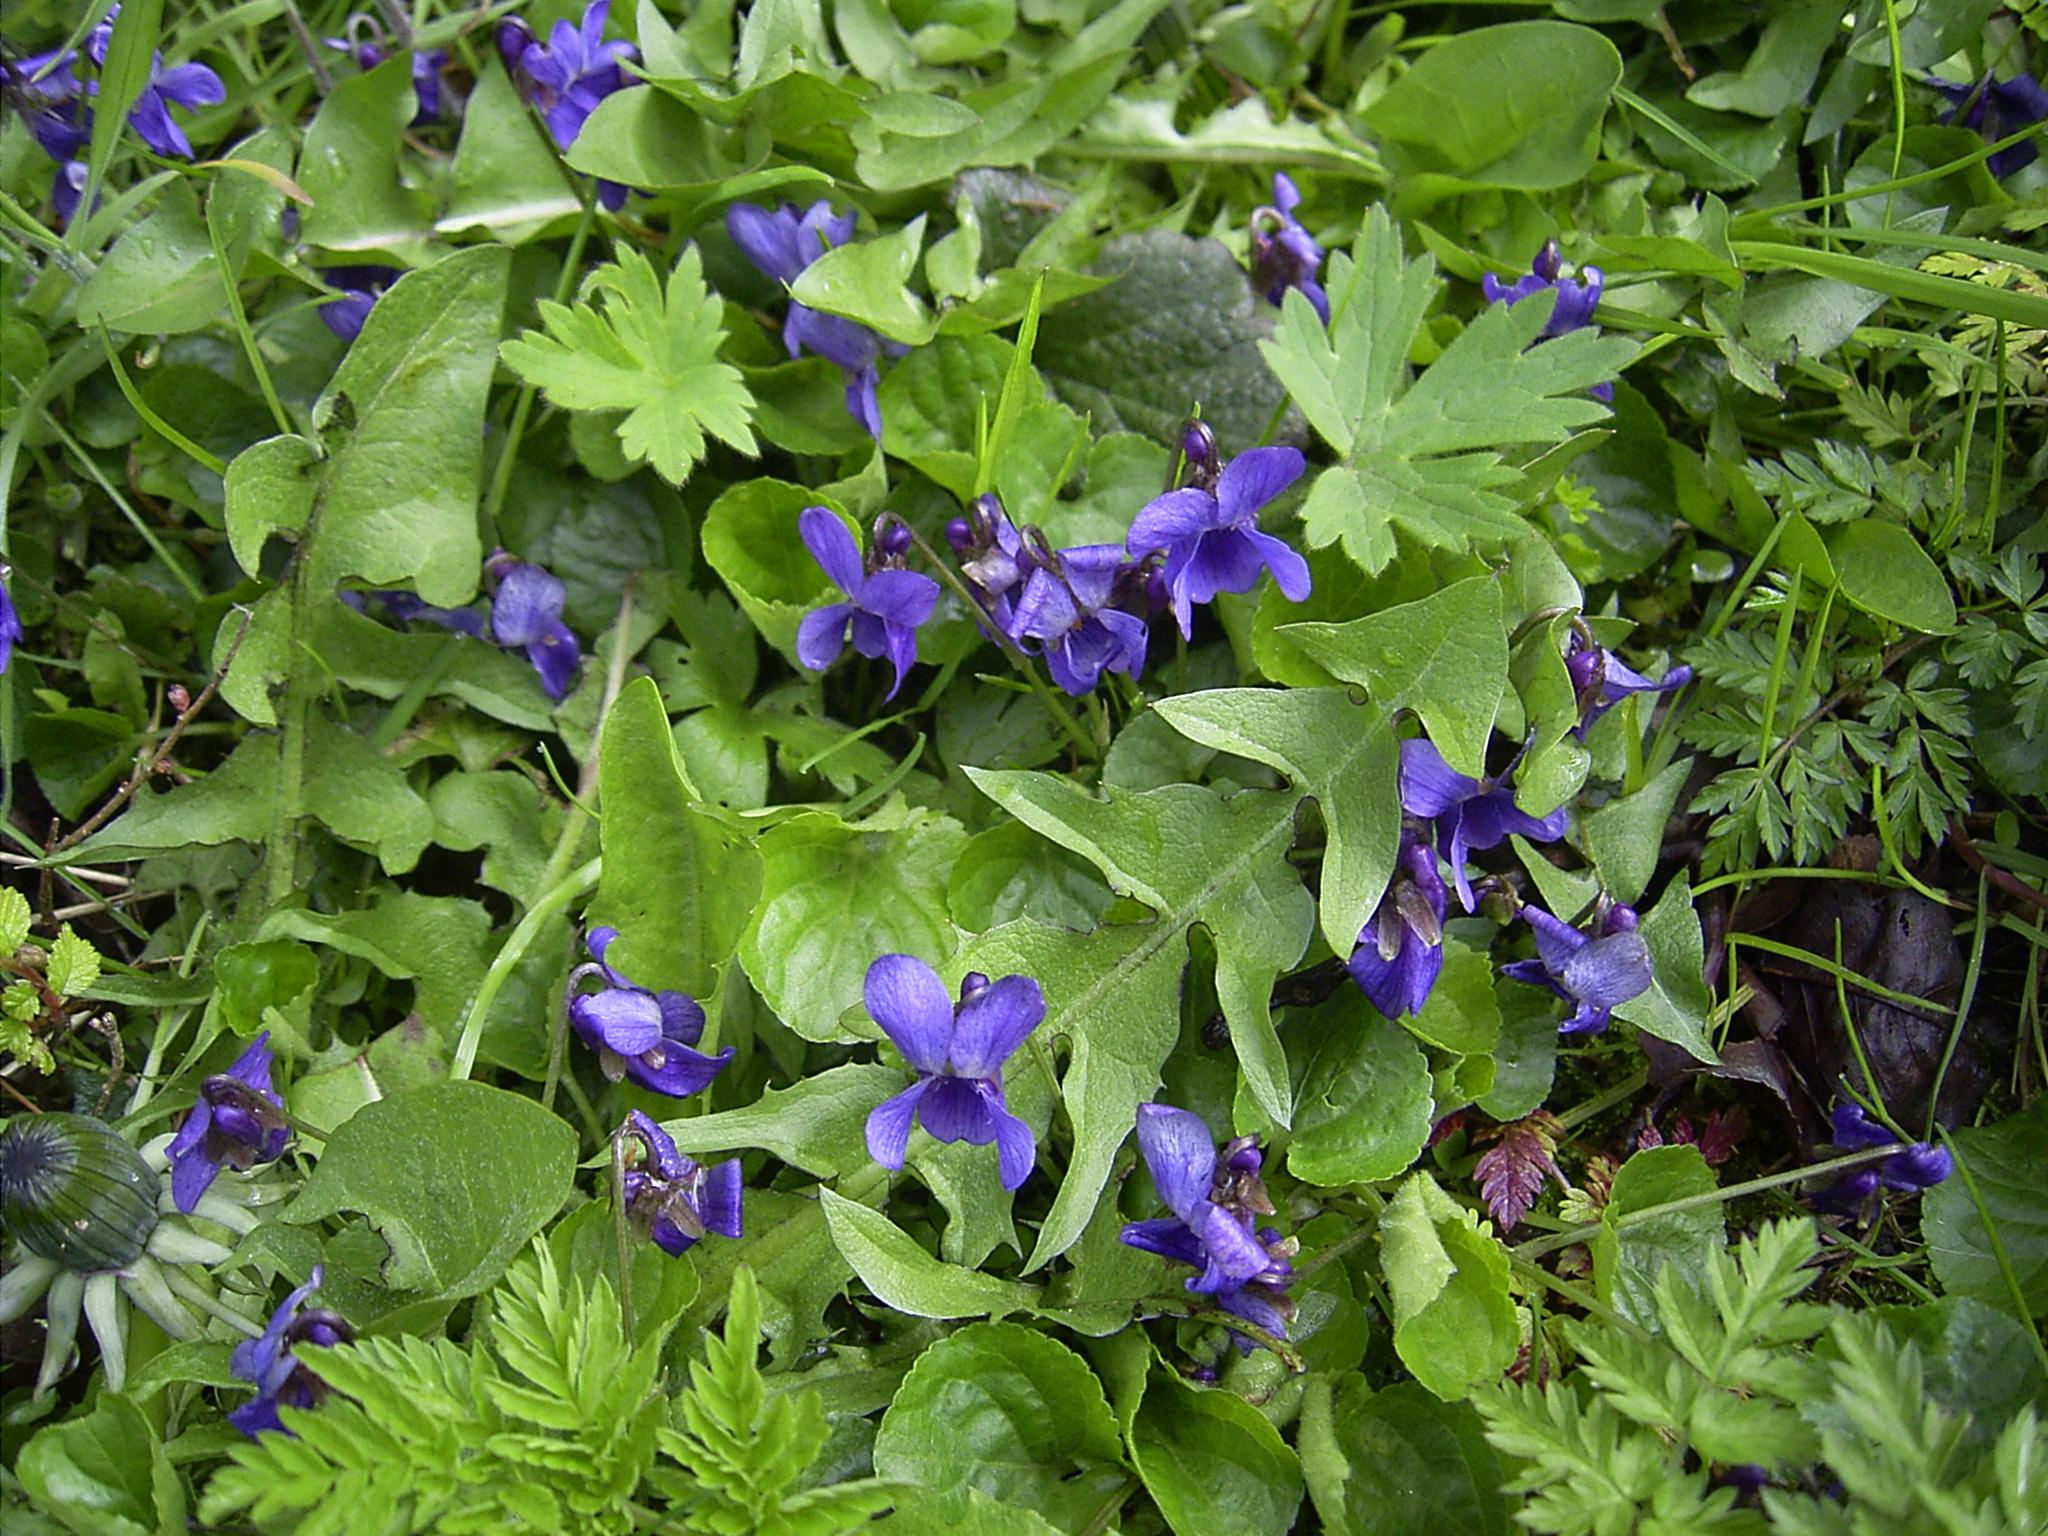 File:Viola-odorata-plants.jpg - Wikimedia Commons Ljubicica